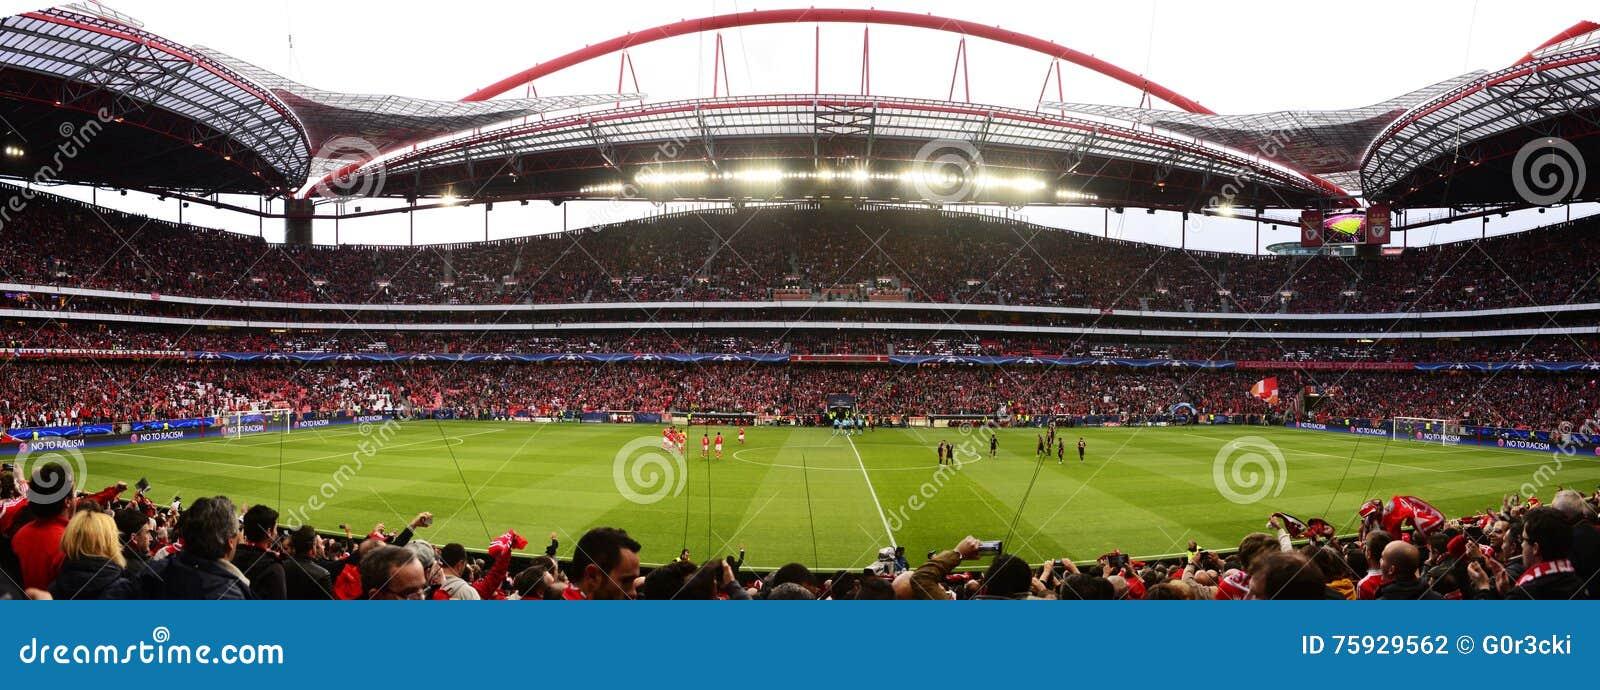 48635be28 Benfica Soccer Stadium Panorama